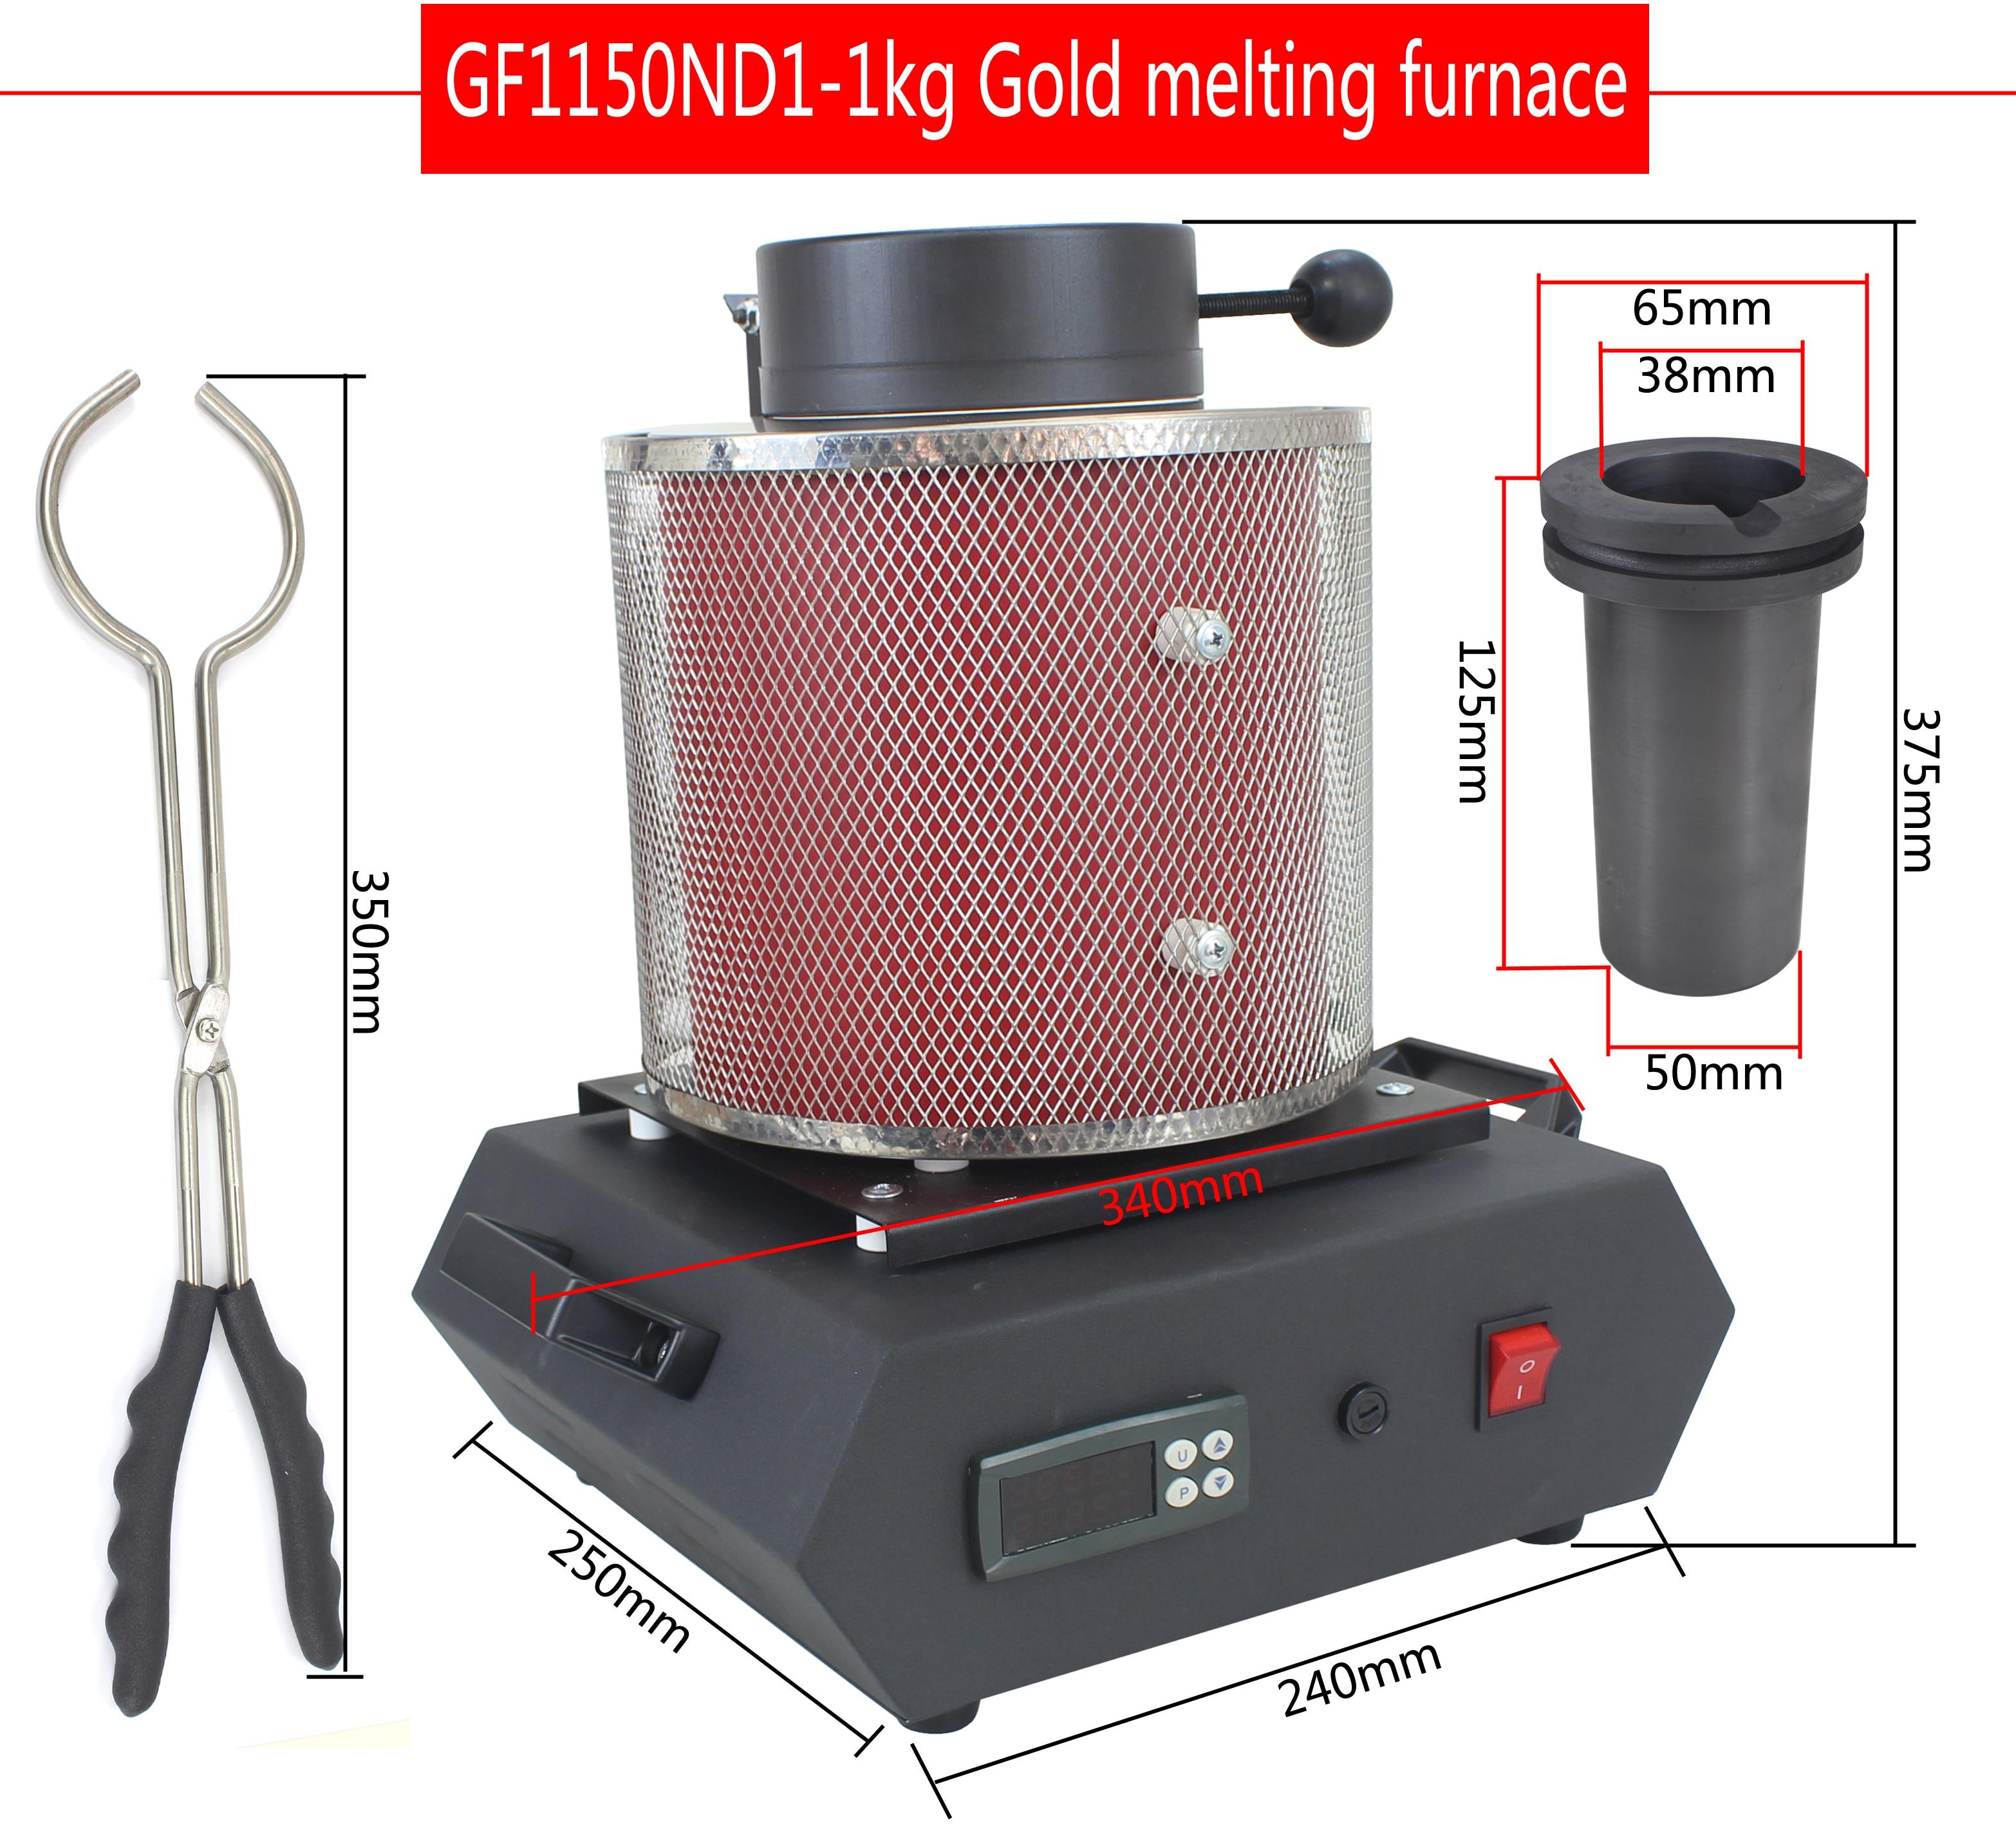 CE  Electric Jewelry Melting Furnace 1KG/2KG/3KG, Aluminum, Copper, Gold, Lead, Silver, Induction Melting Ovan Furnace